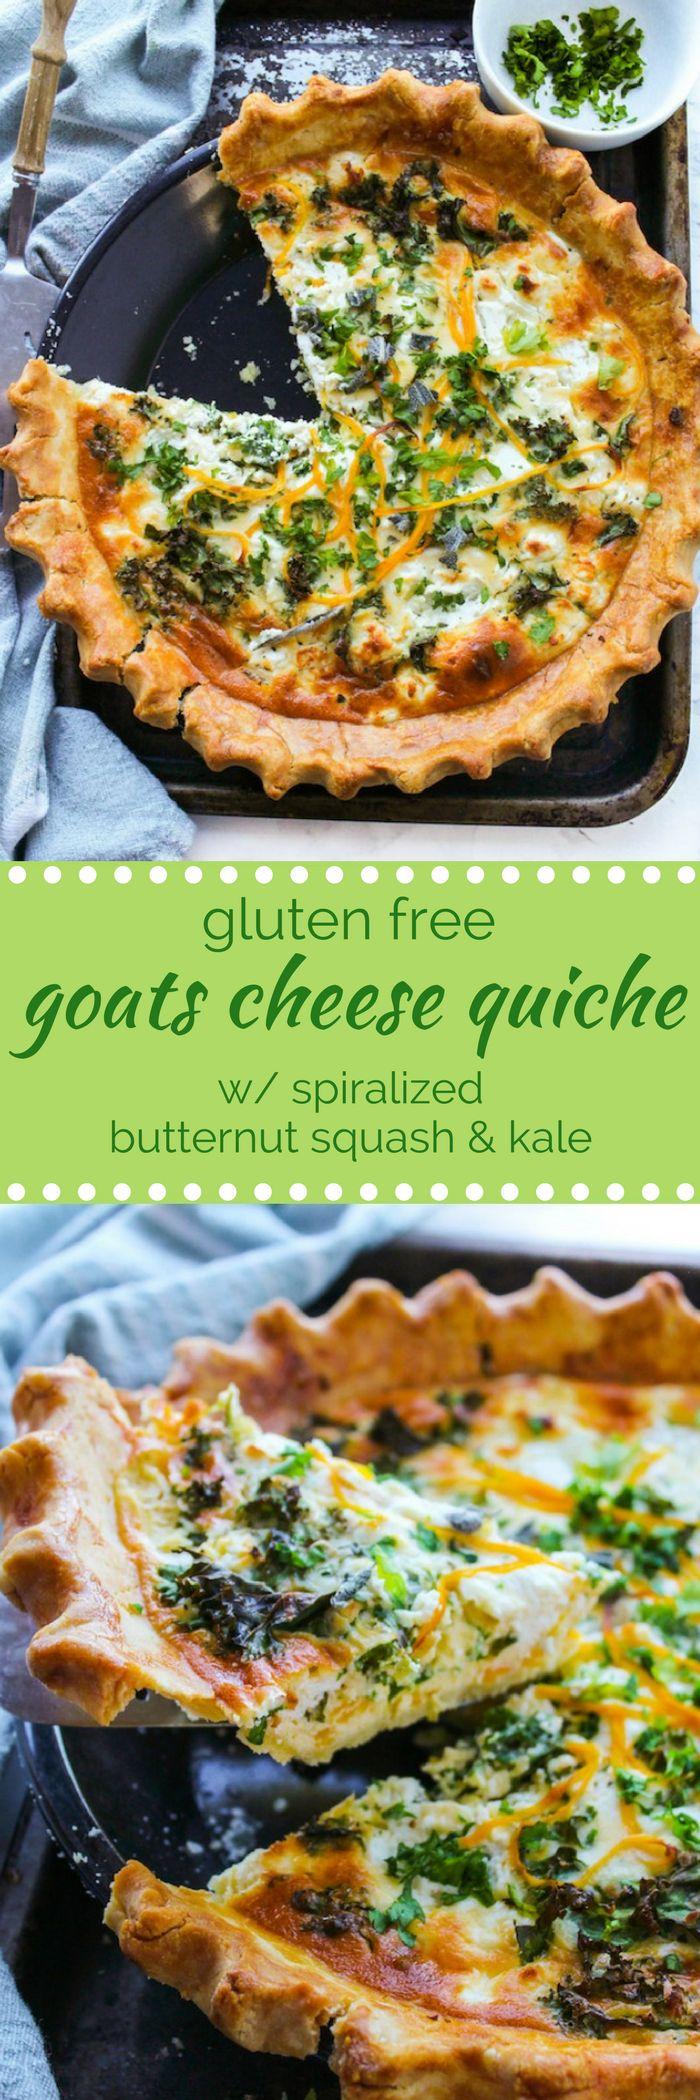 Gluten Free Butternut Squash Kale & Goats Cheese Quiche